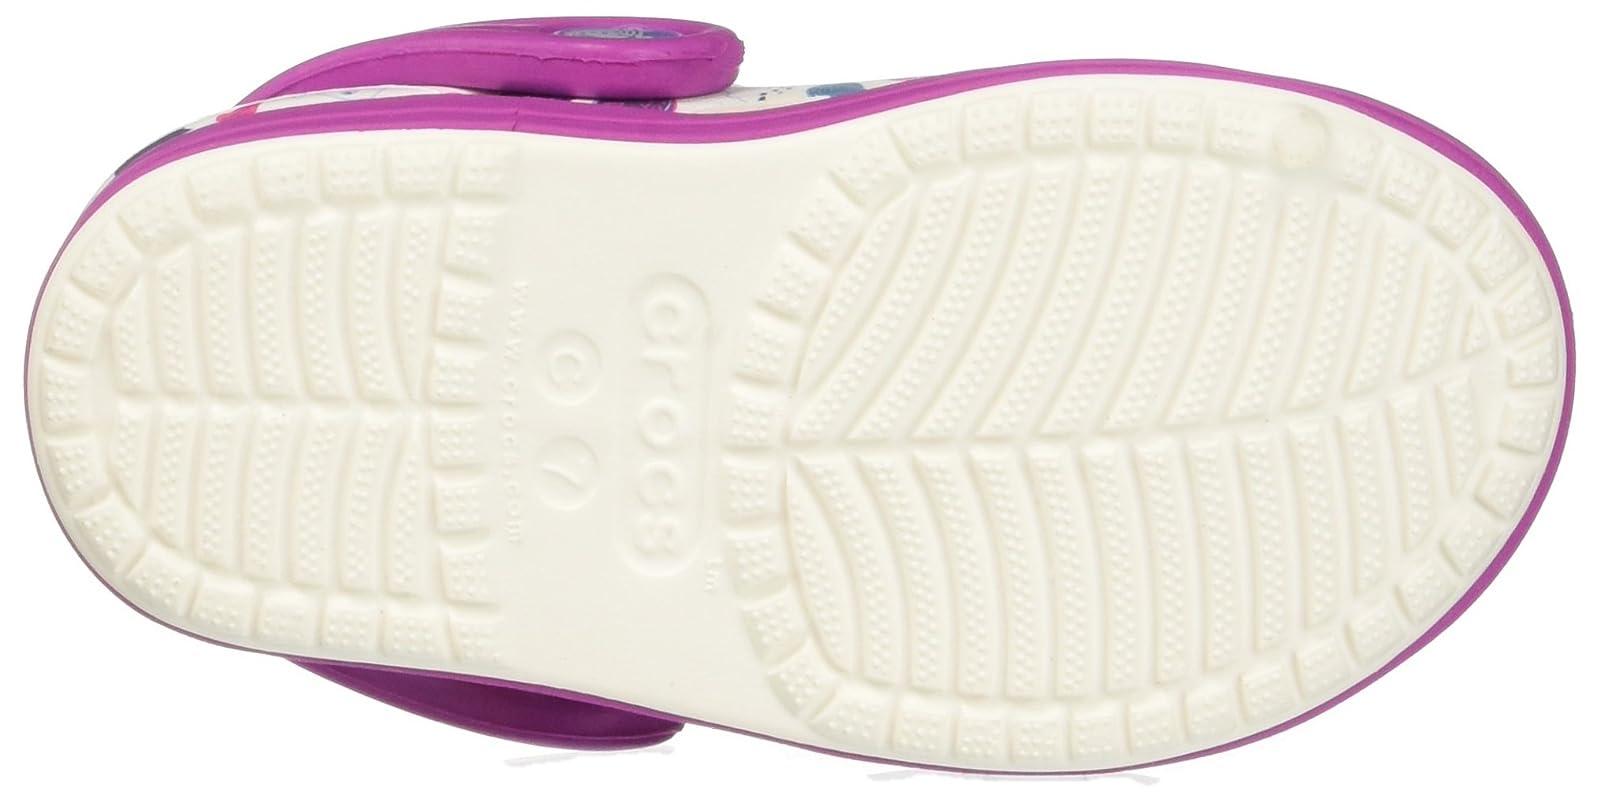 67316bb1069132 ... crocs Kids  Bump It Graphic K Clog 204126 White Vibrant Violet - 3 ...